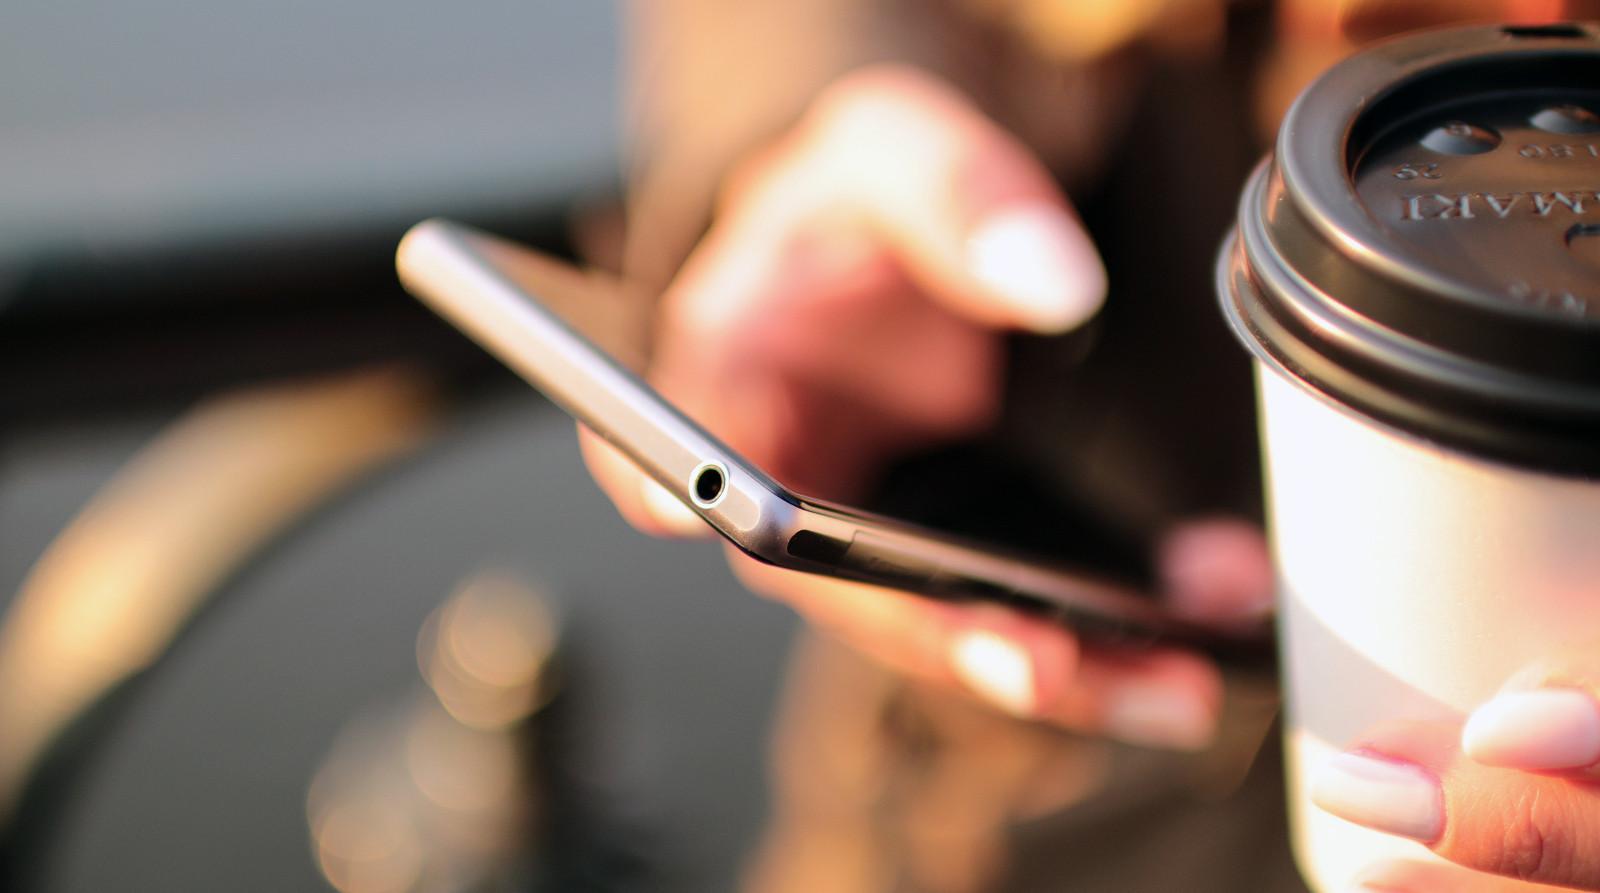 Mobile-Banking Apps in Deutschland